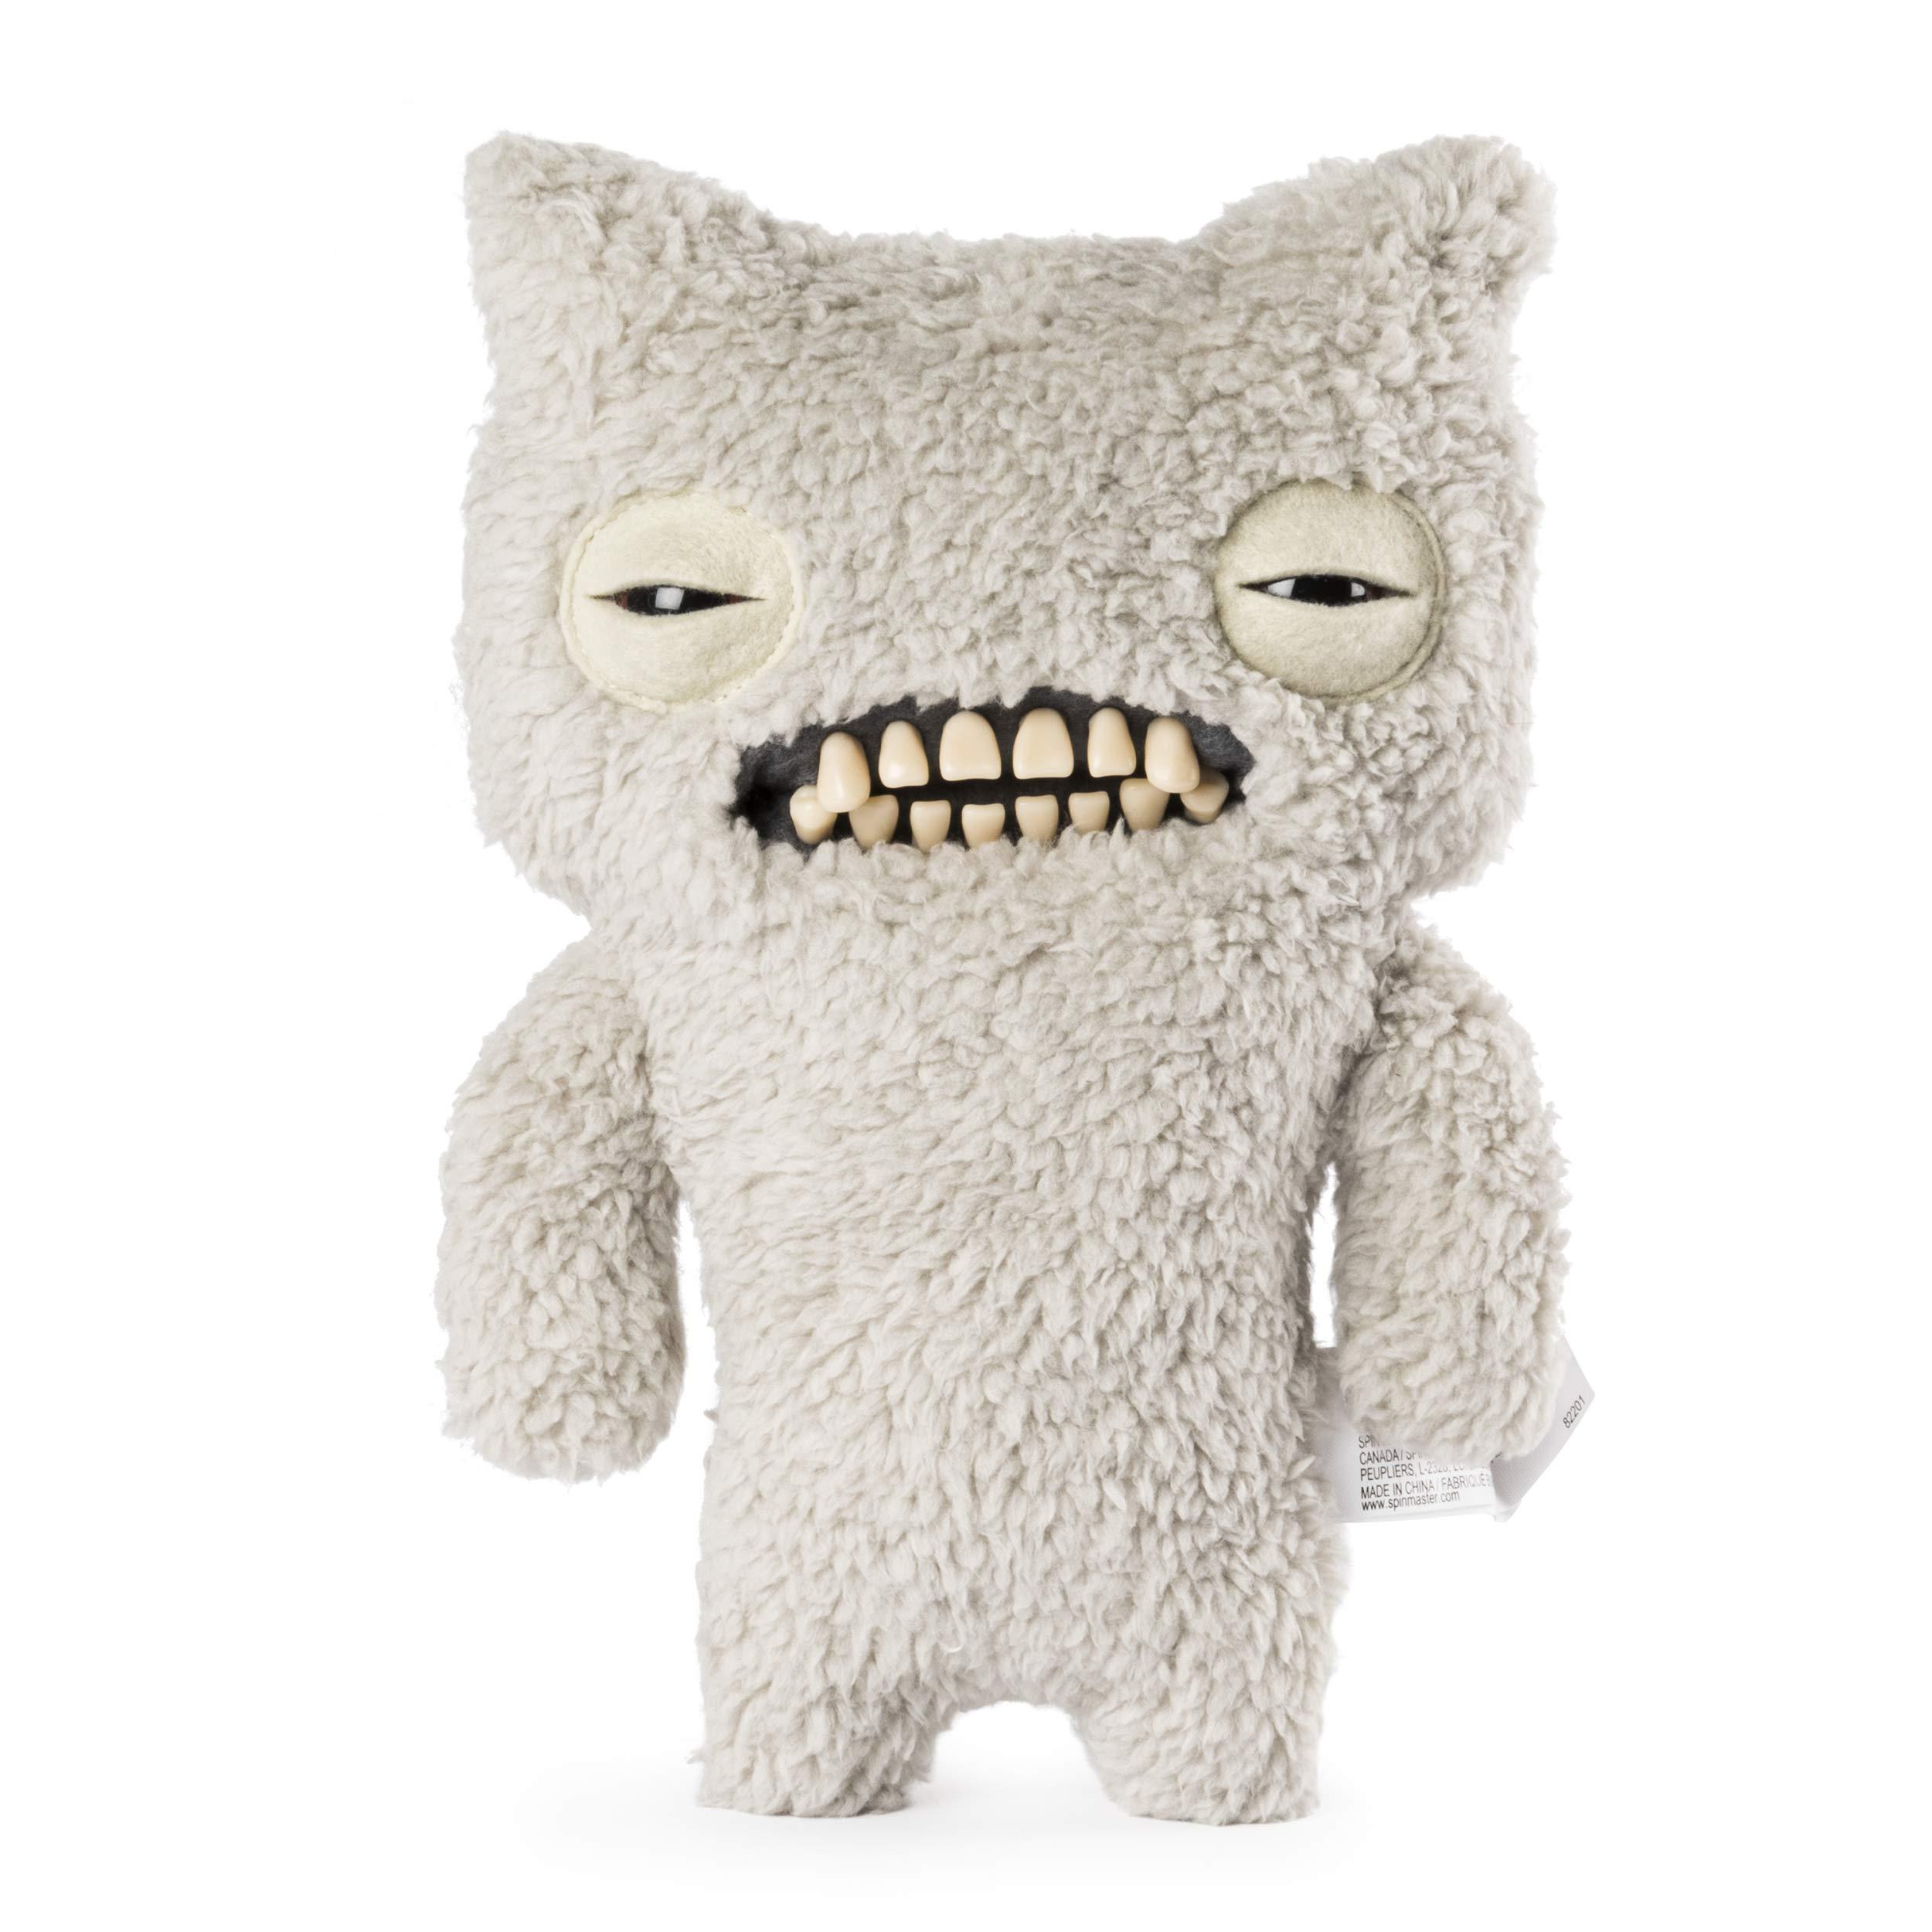 Spin Master Fuggler Funny Ugly Monster Deluxe Stuffed Animal Medium 9'' Plush (Munch Munch) by Fuggler